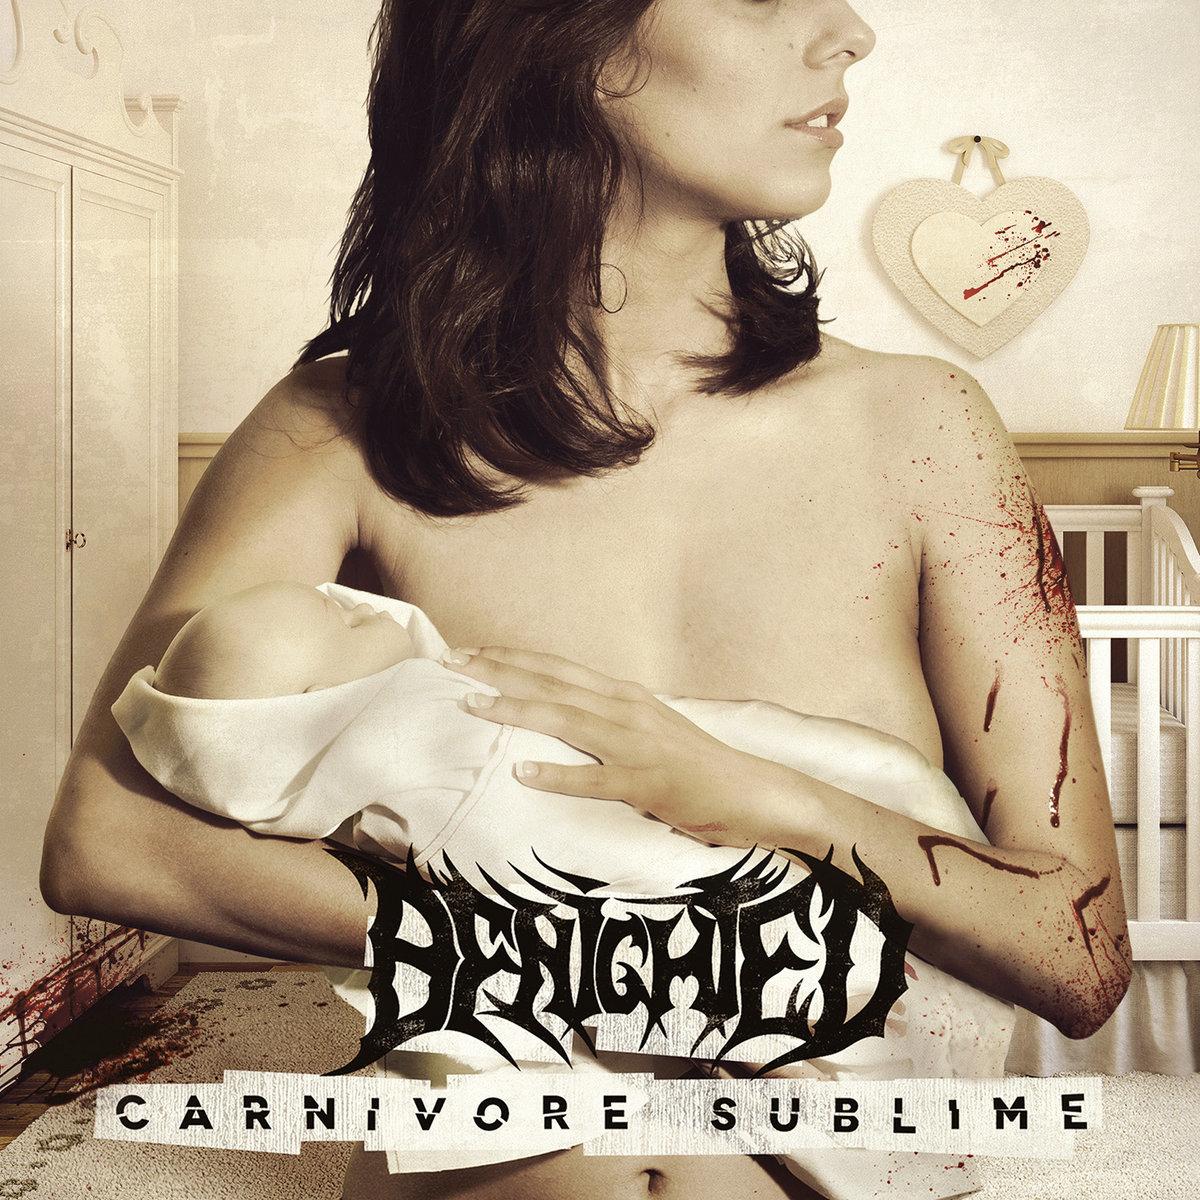 benighted-carnivore.jpg